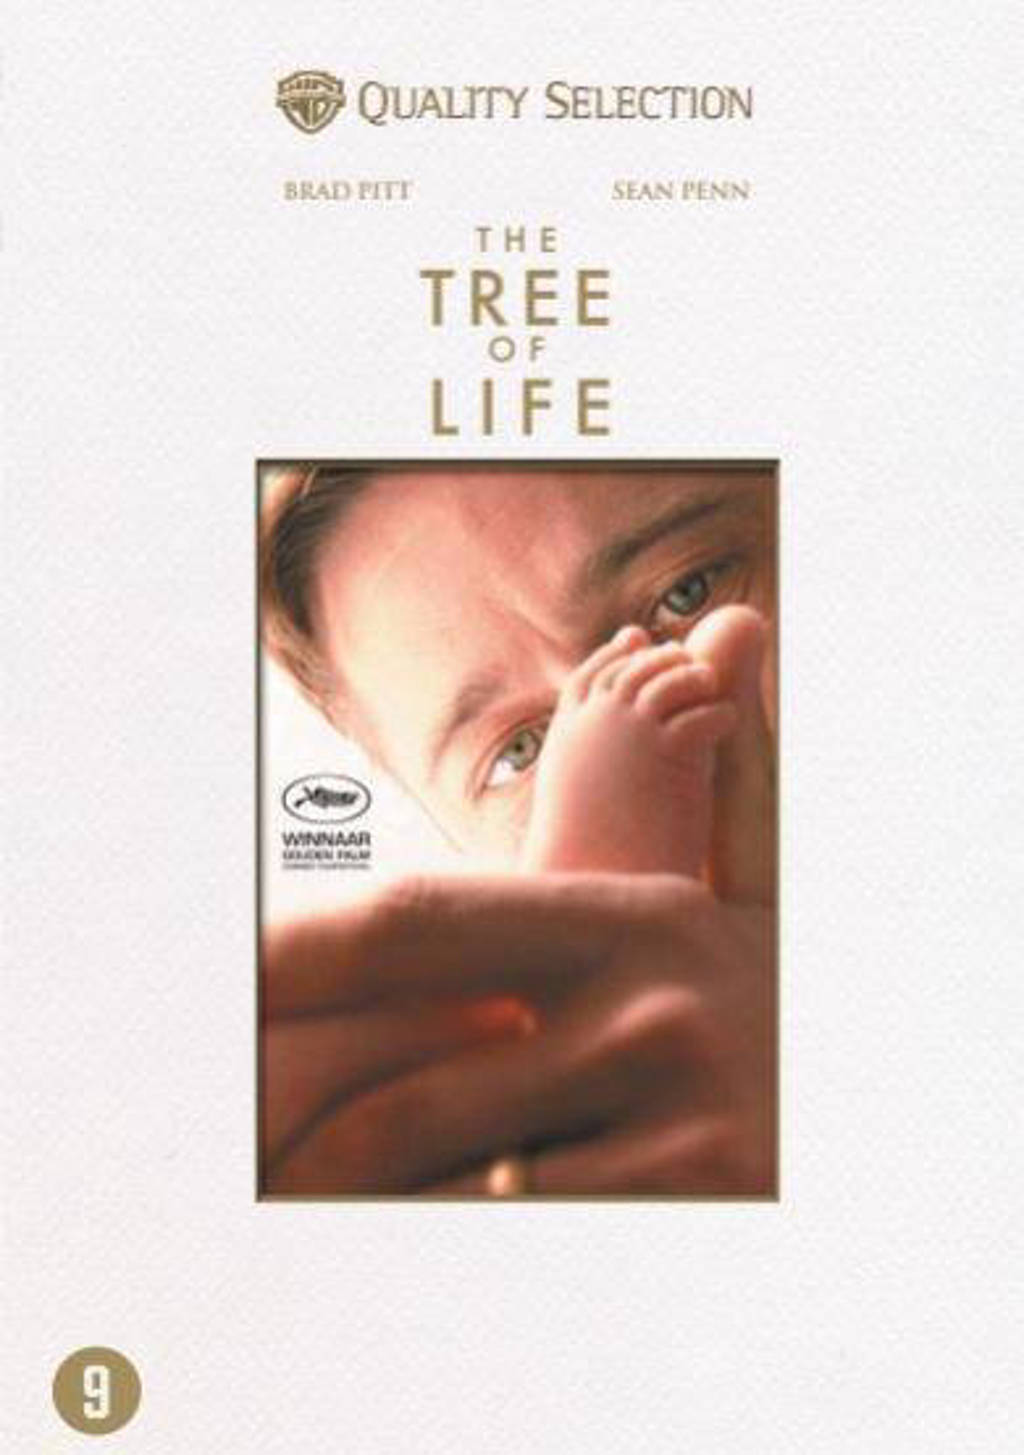 Tree of life (DVD)